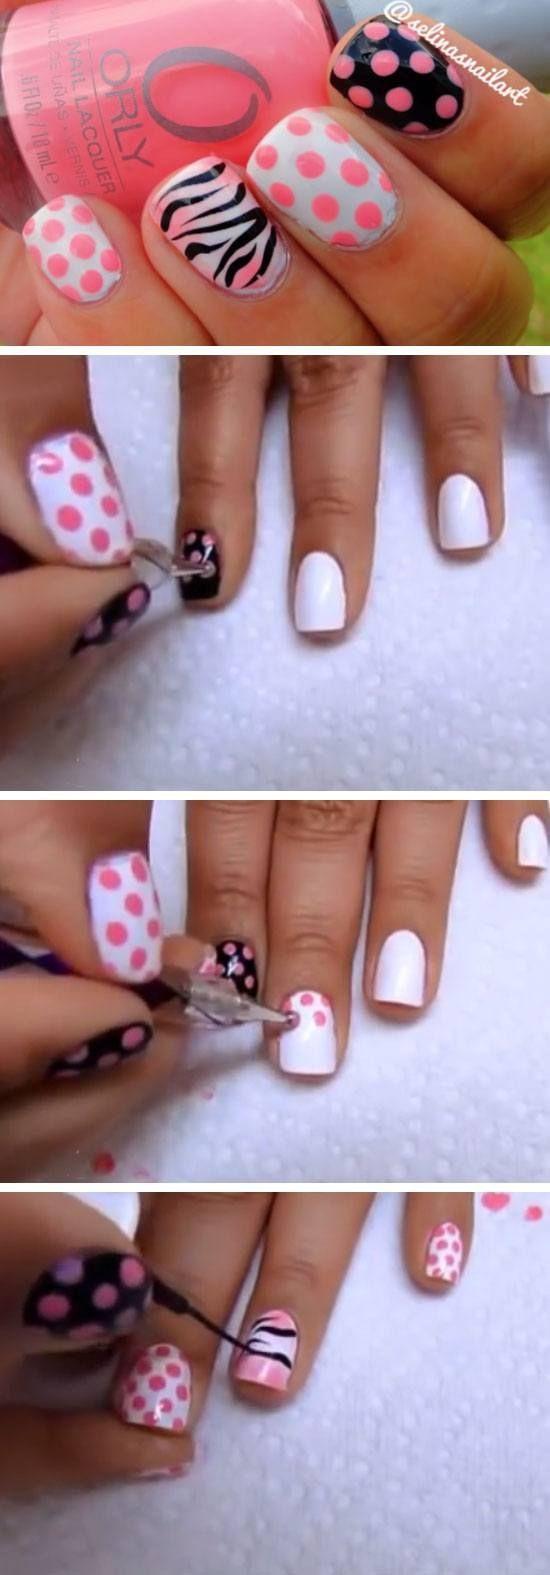 easy summer nail art